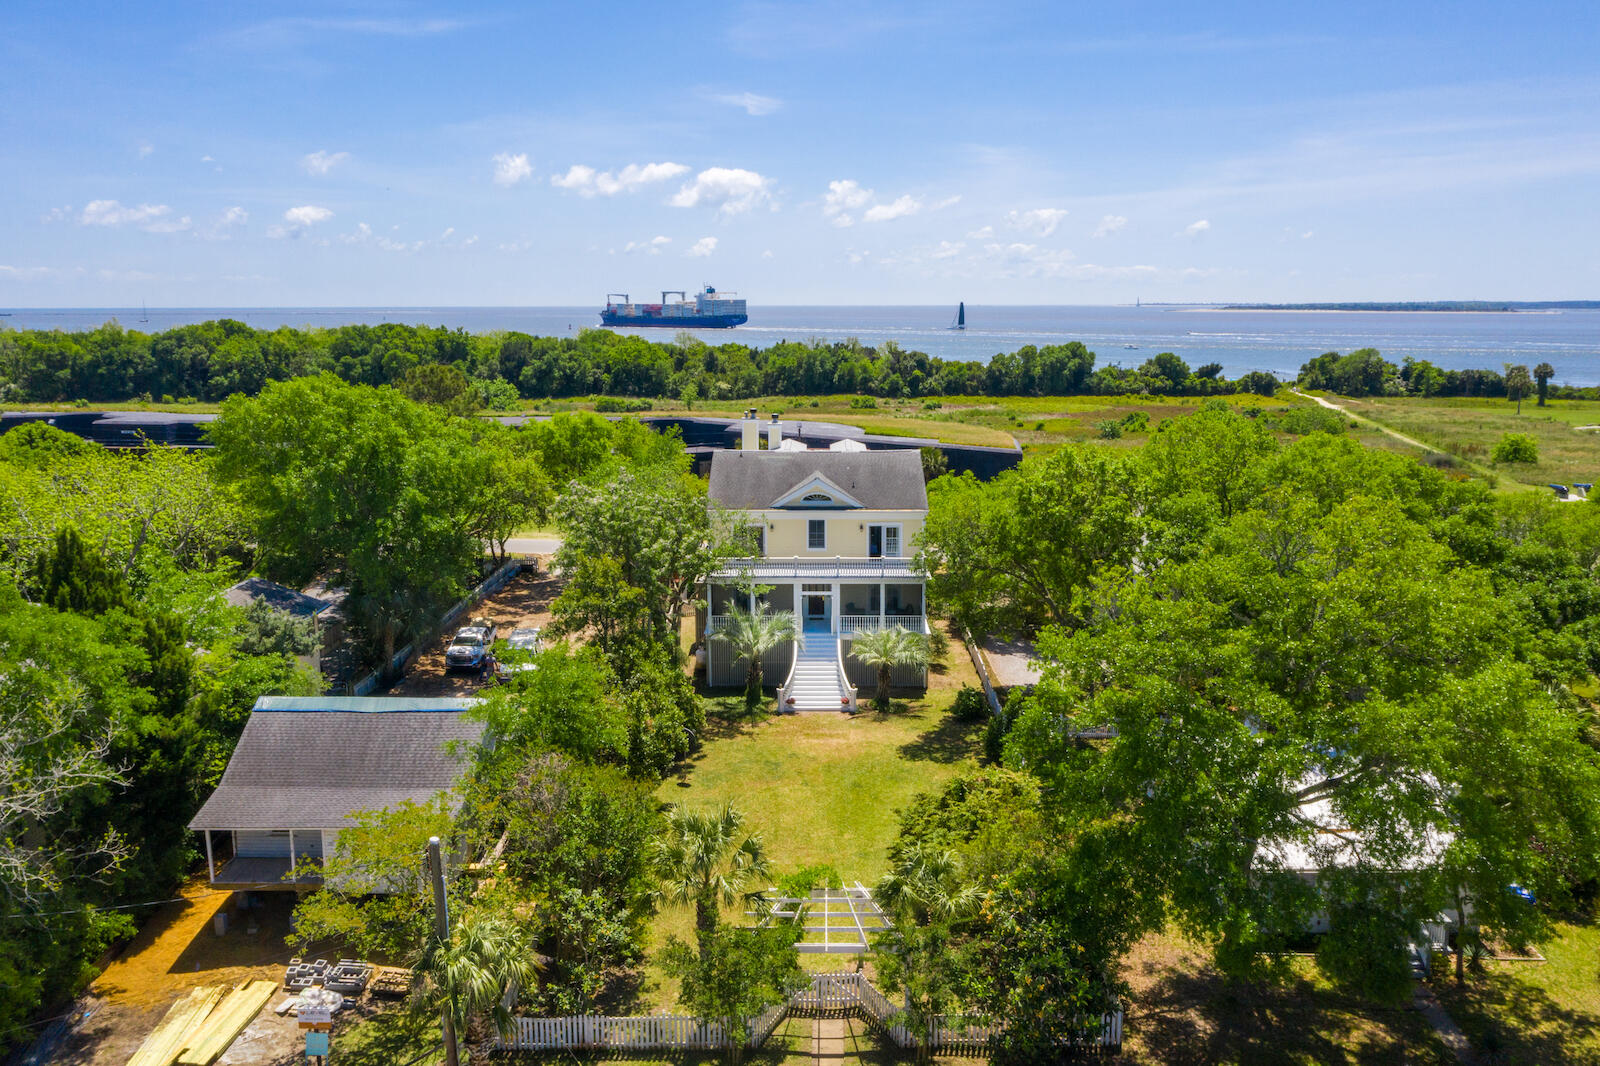 Sullivans Island Homes For Sale - 1318 Poe, Sullivans Island, SC - 41